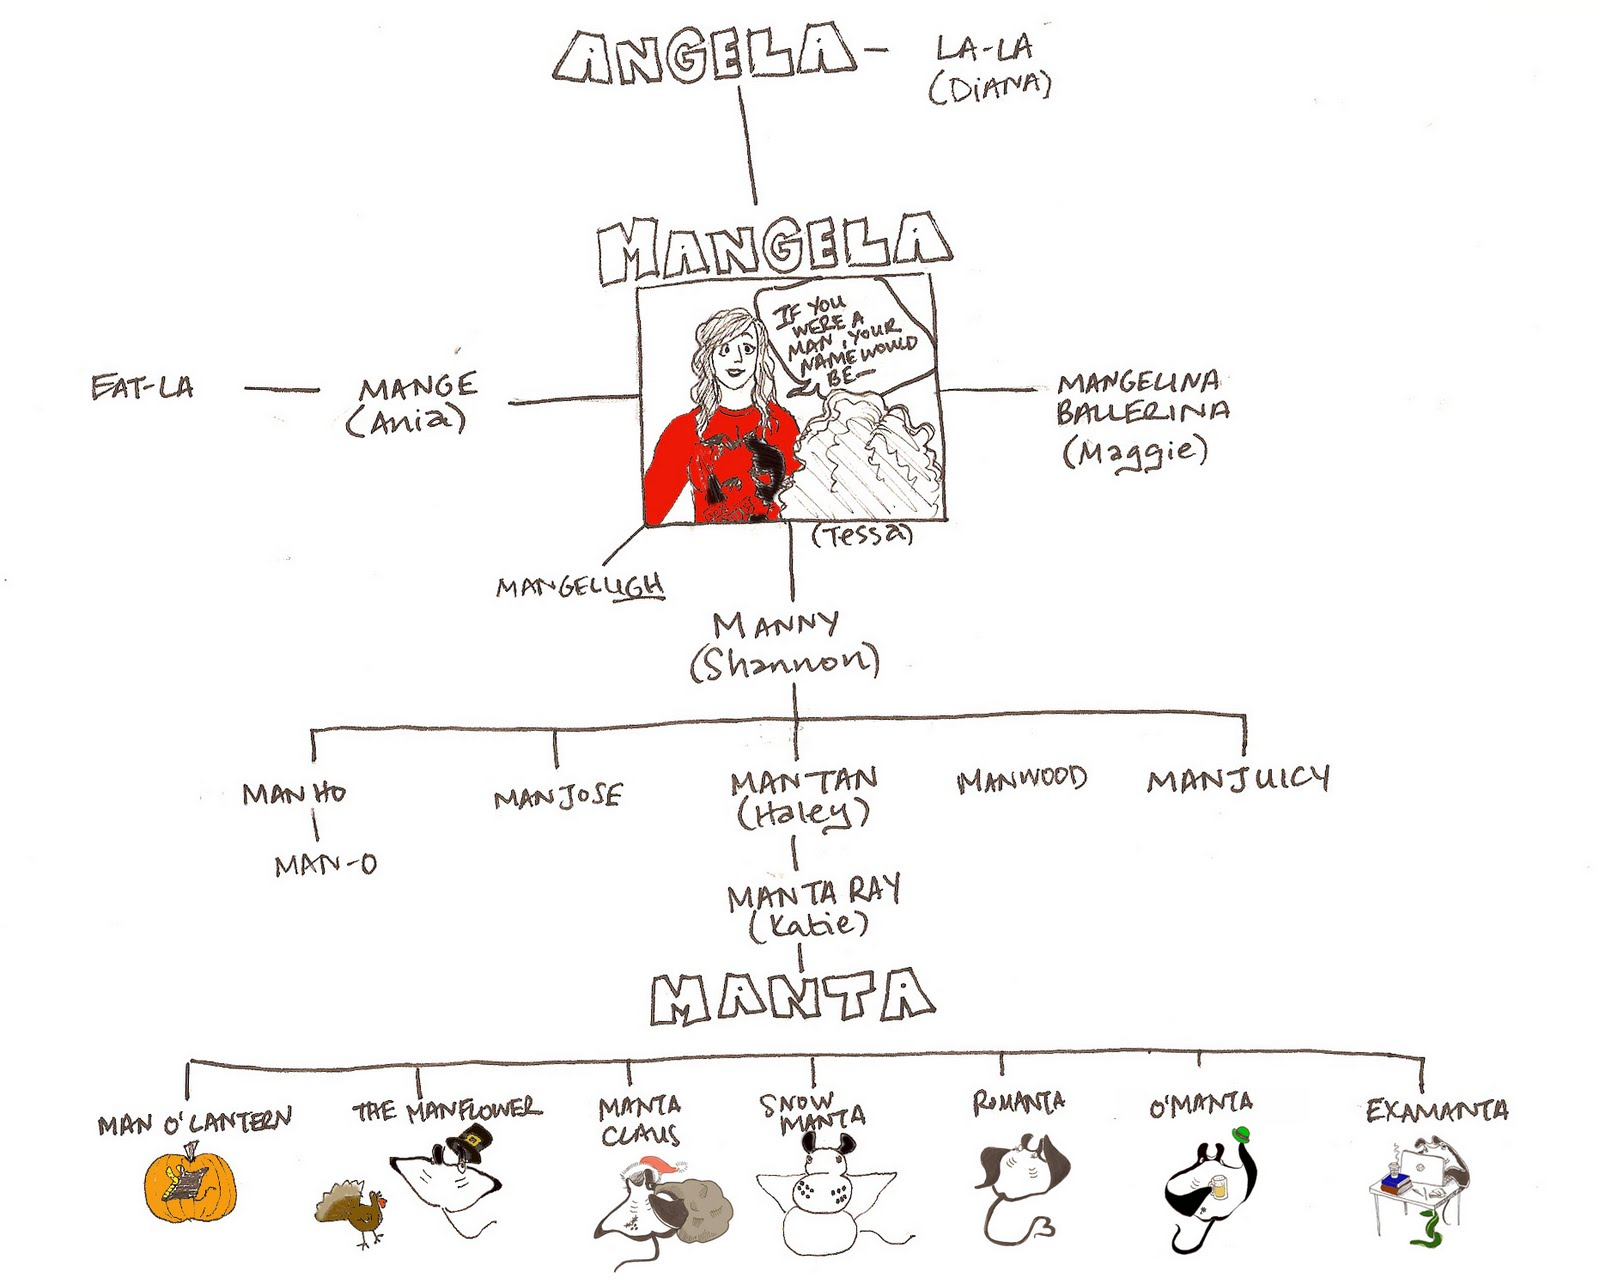 Manta Ray Evolution on Lemur Food Web Diagram